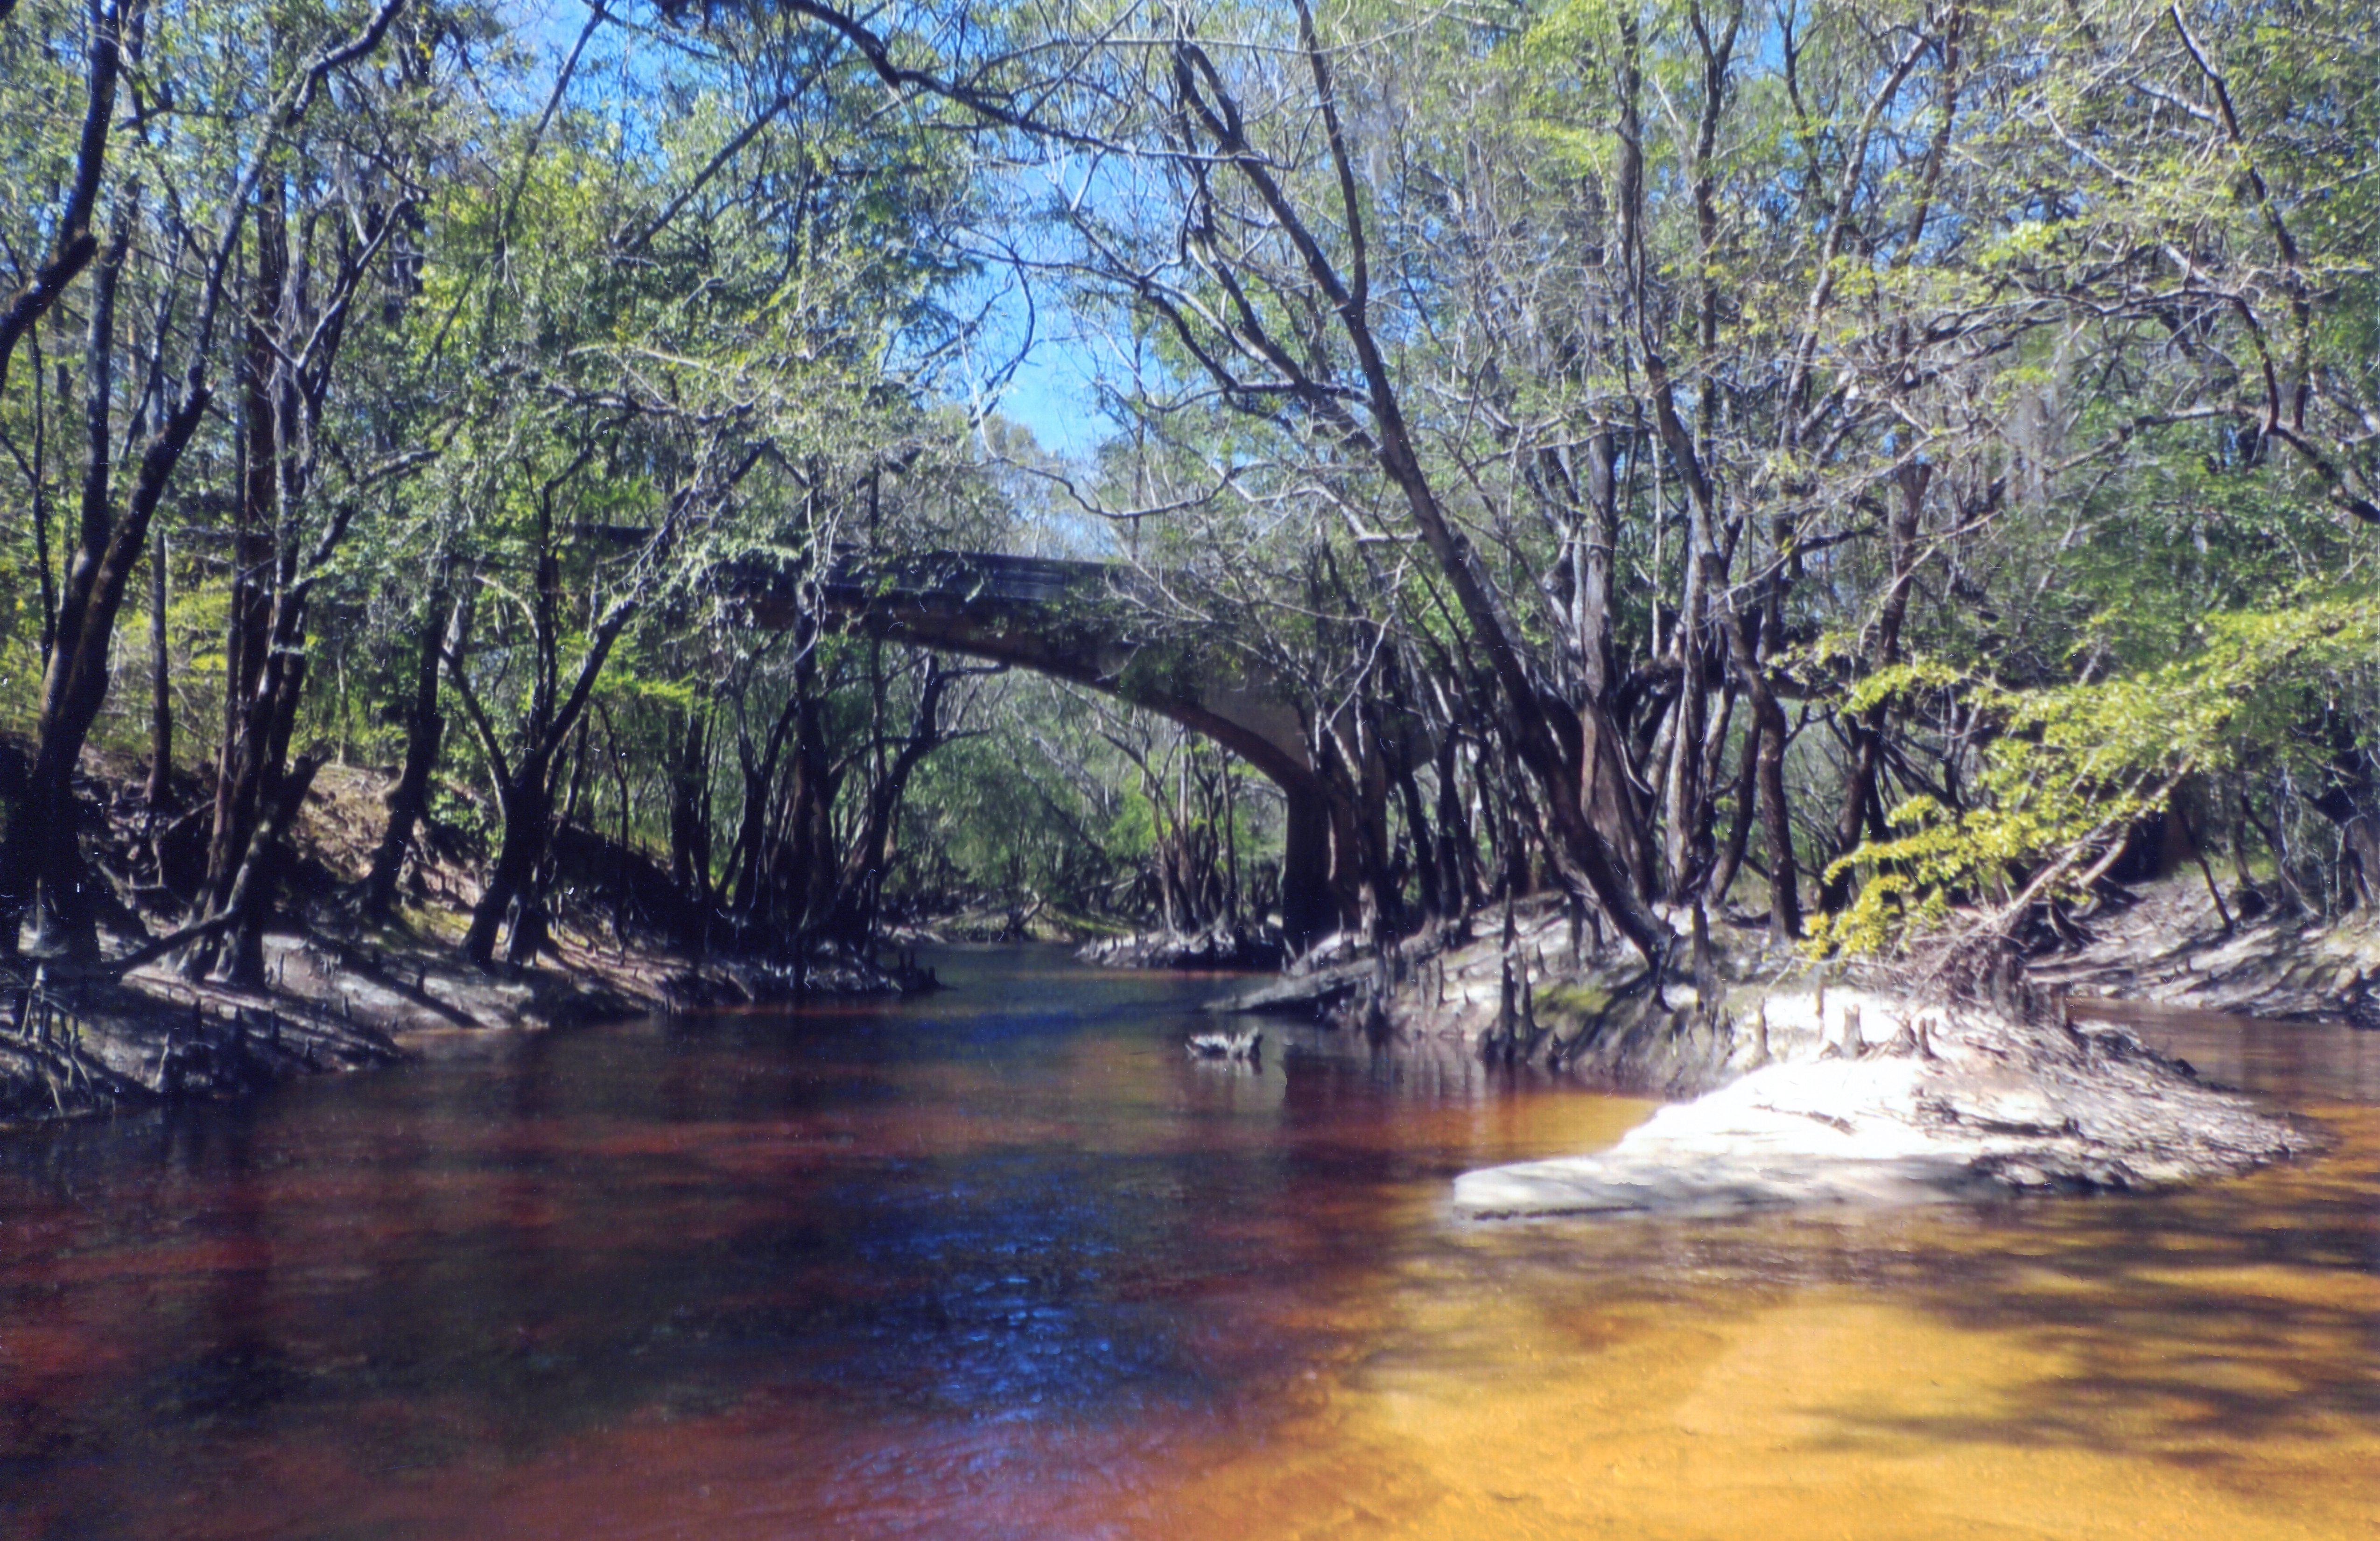 5099x3302 On a summer day, Stone Bridge, in Stone Bridge, Little River, by Dan Phillips, for WWALS.net, 1 August 2016